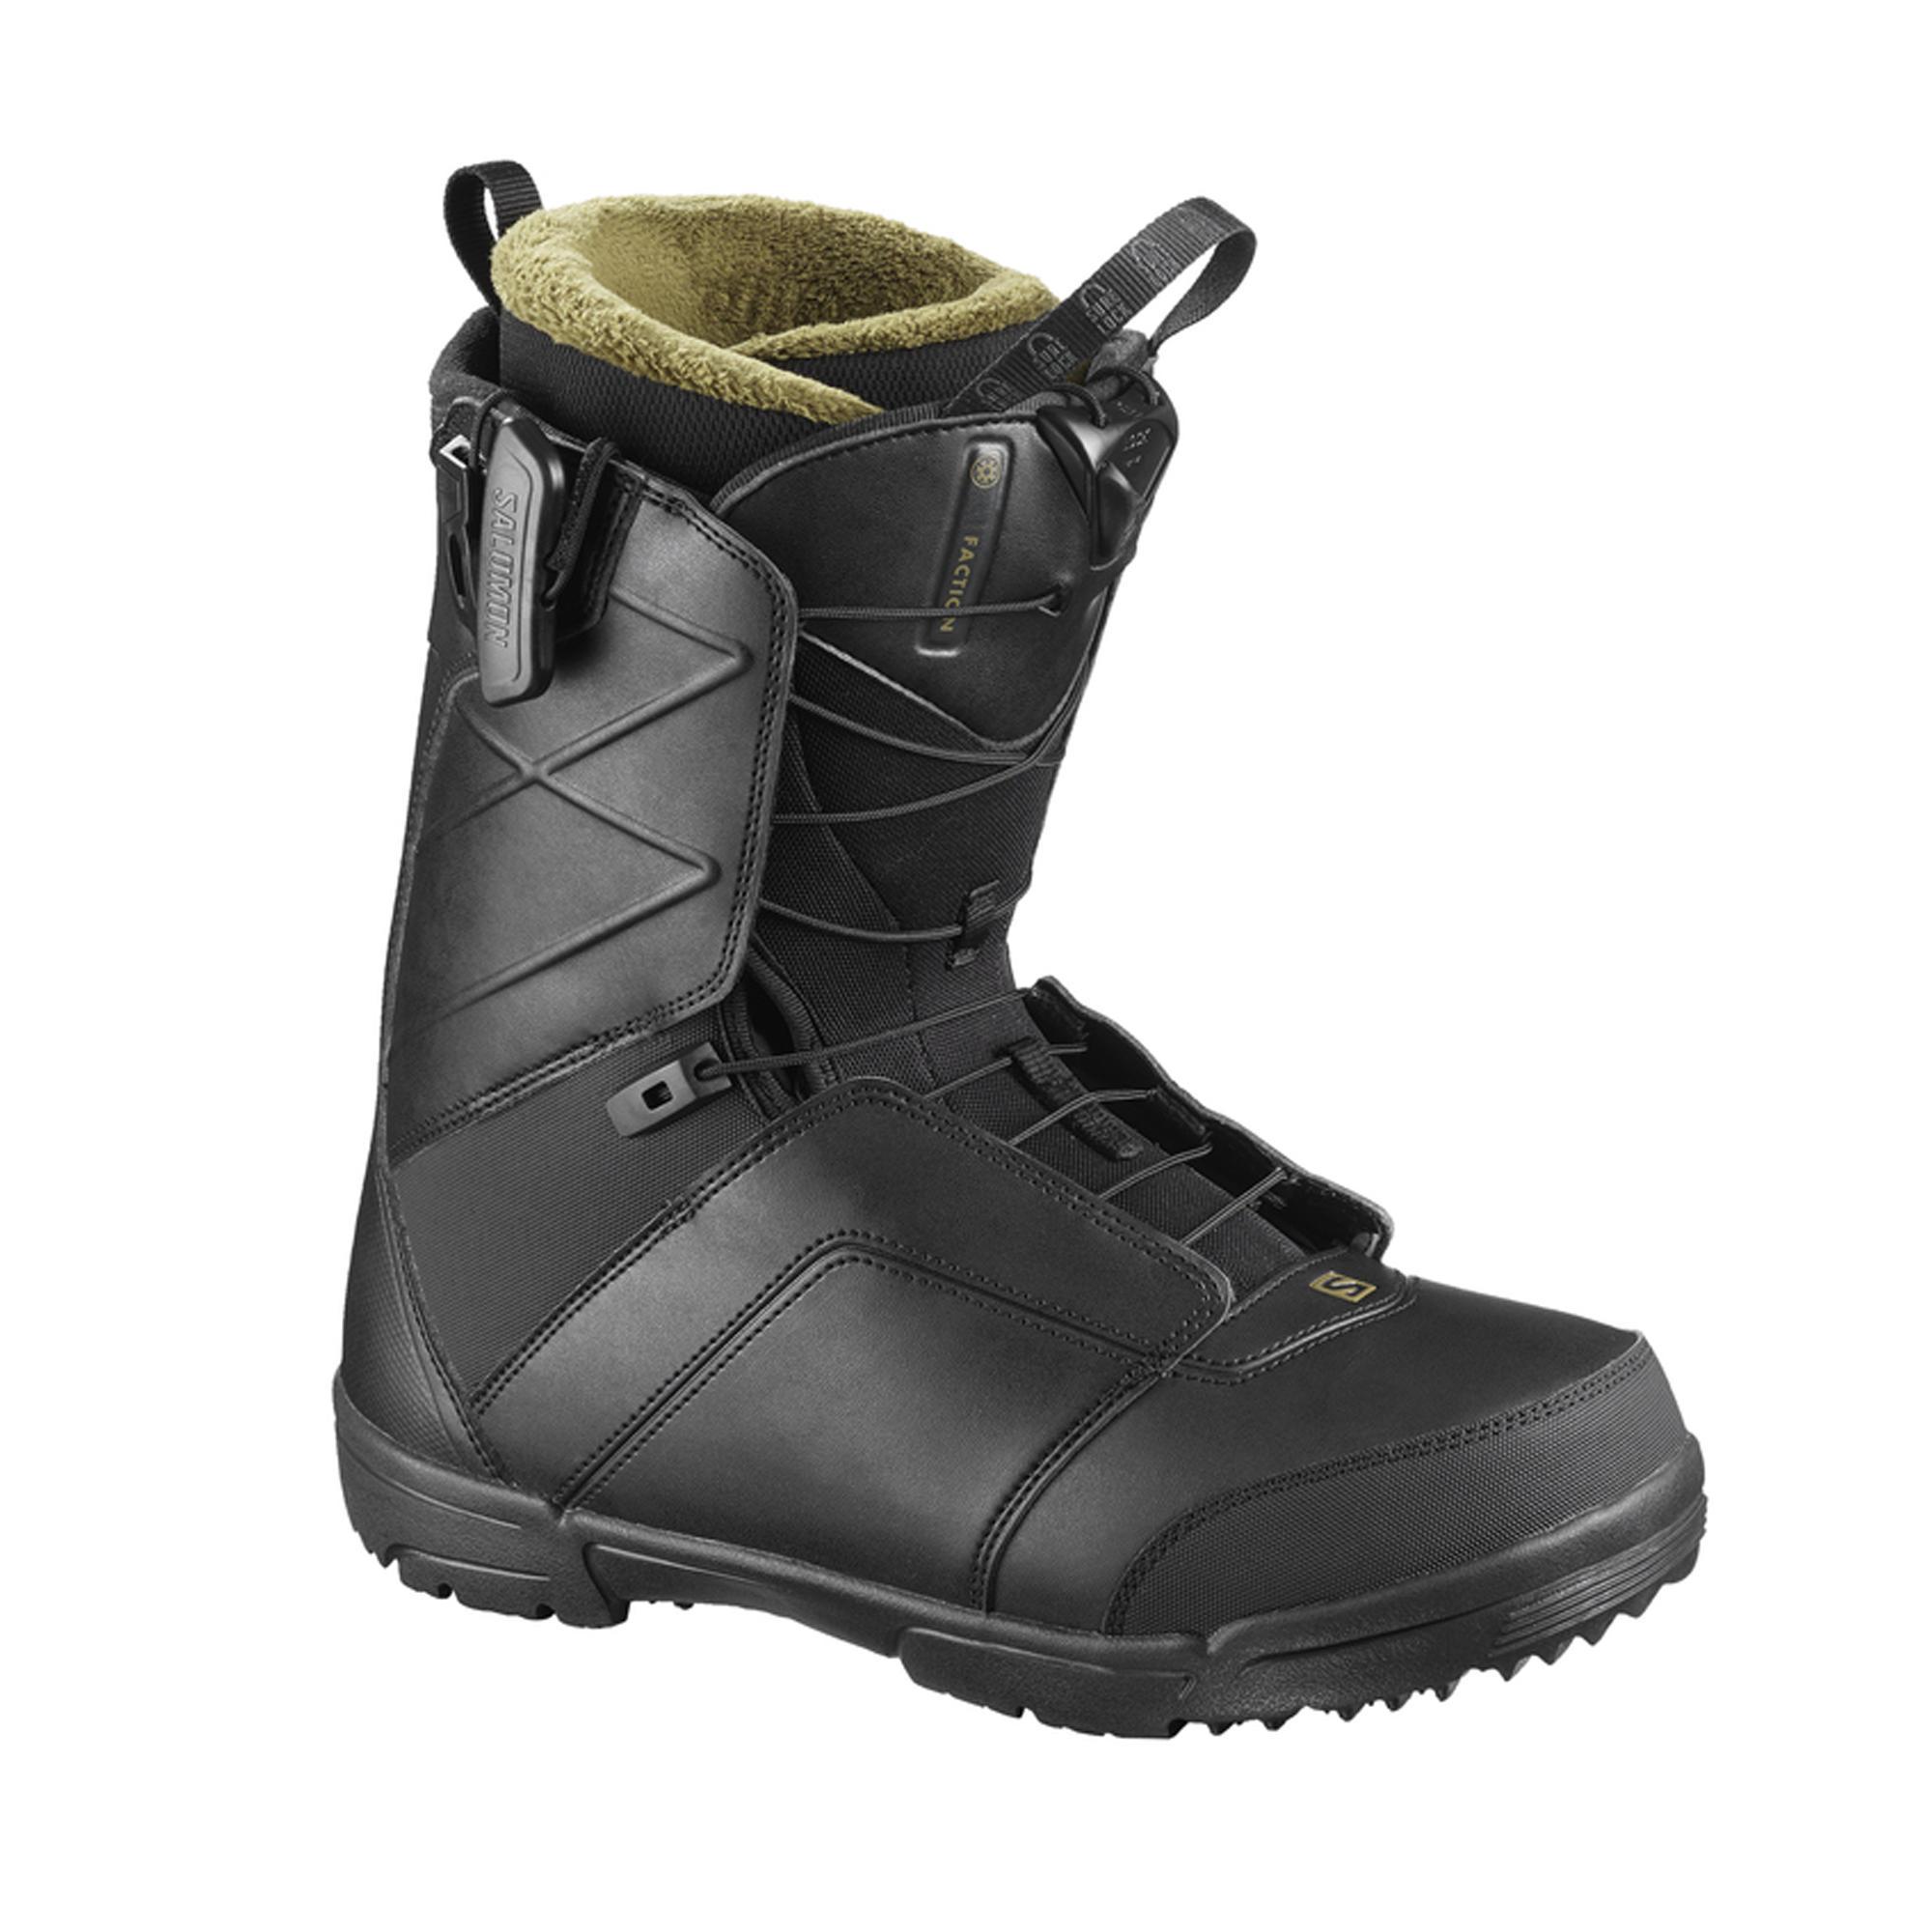 Chaussures de snowboard homme all mountain, Faction Zone Lock, noires - Salomon